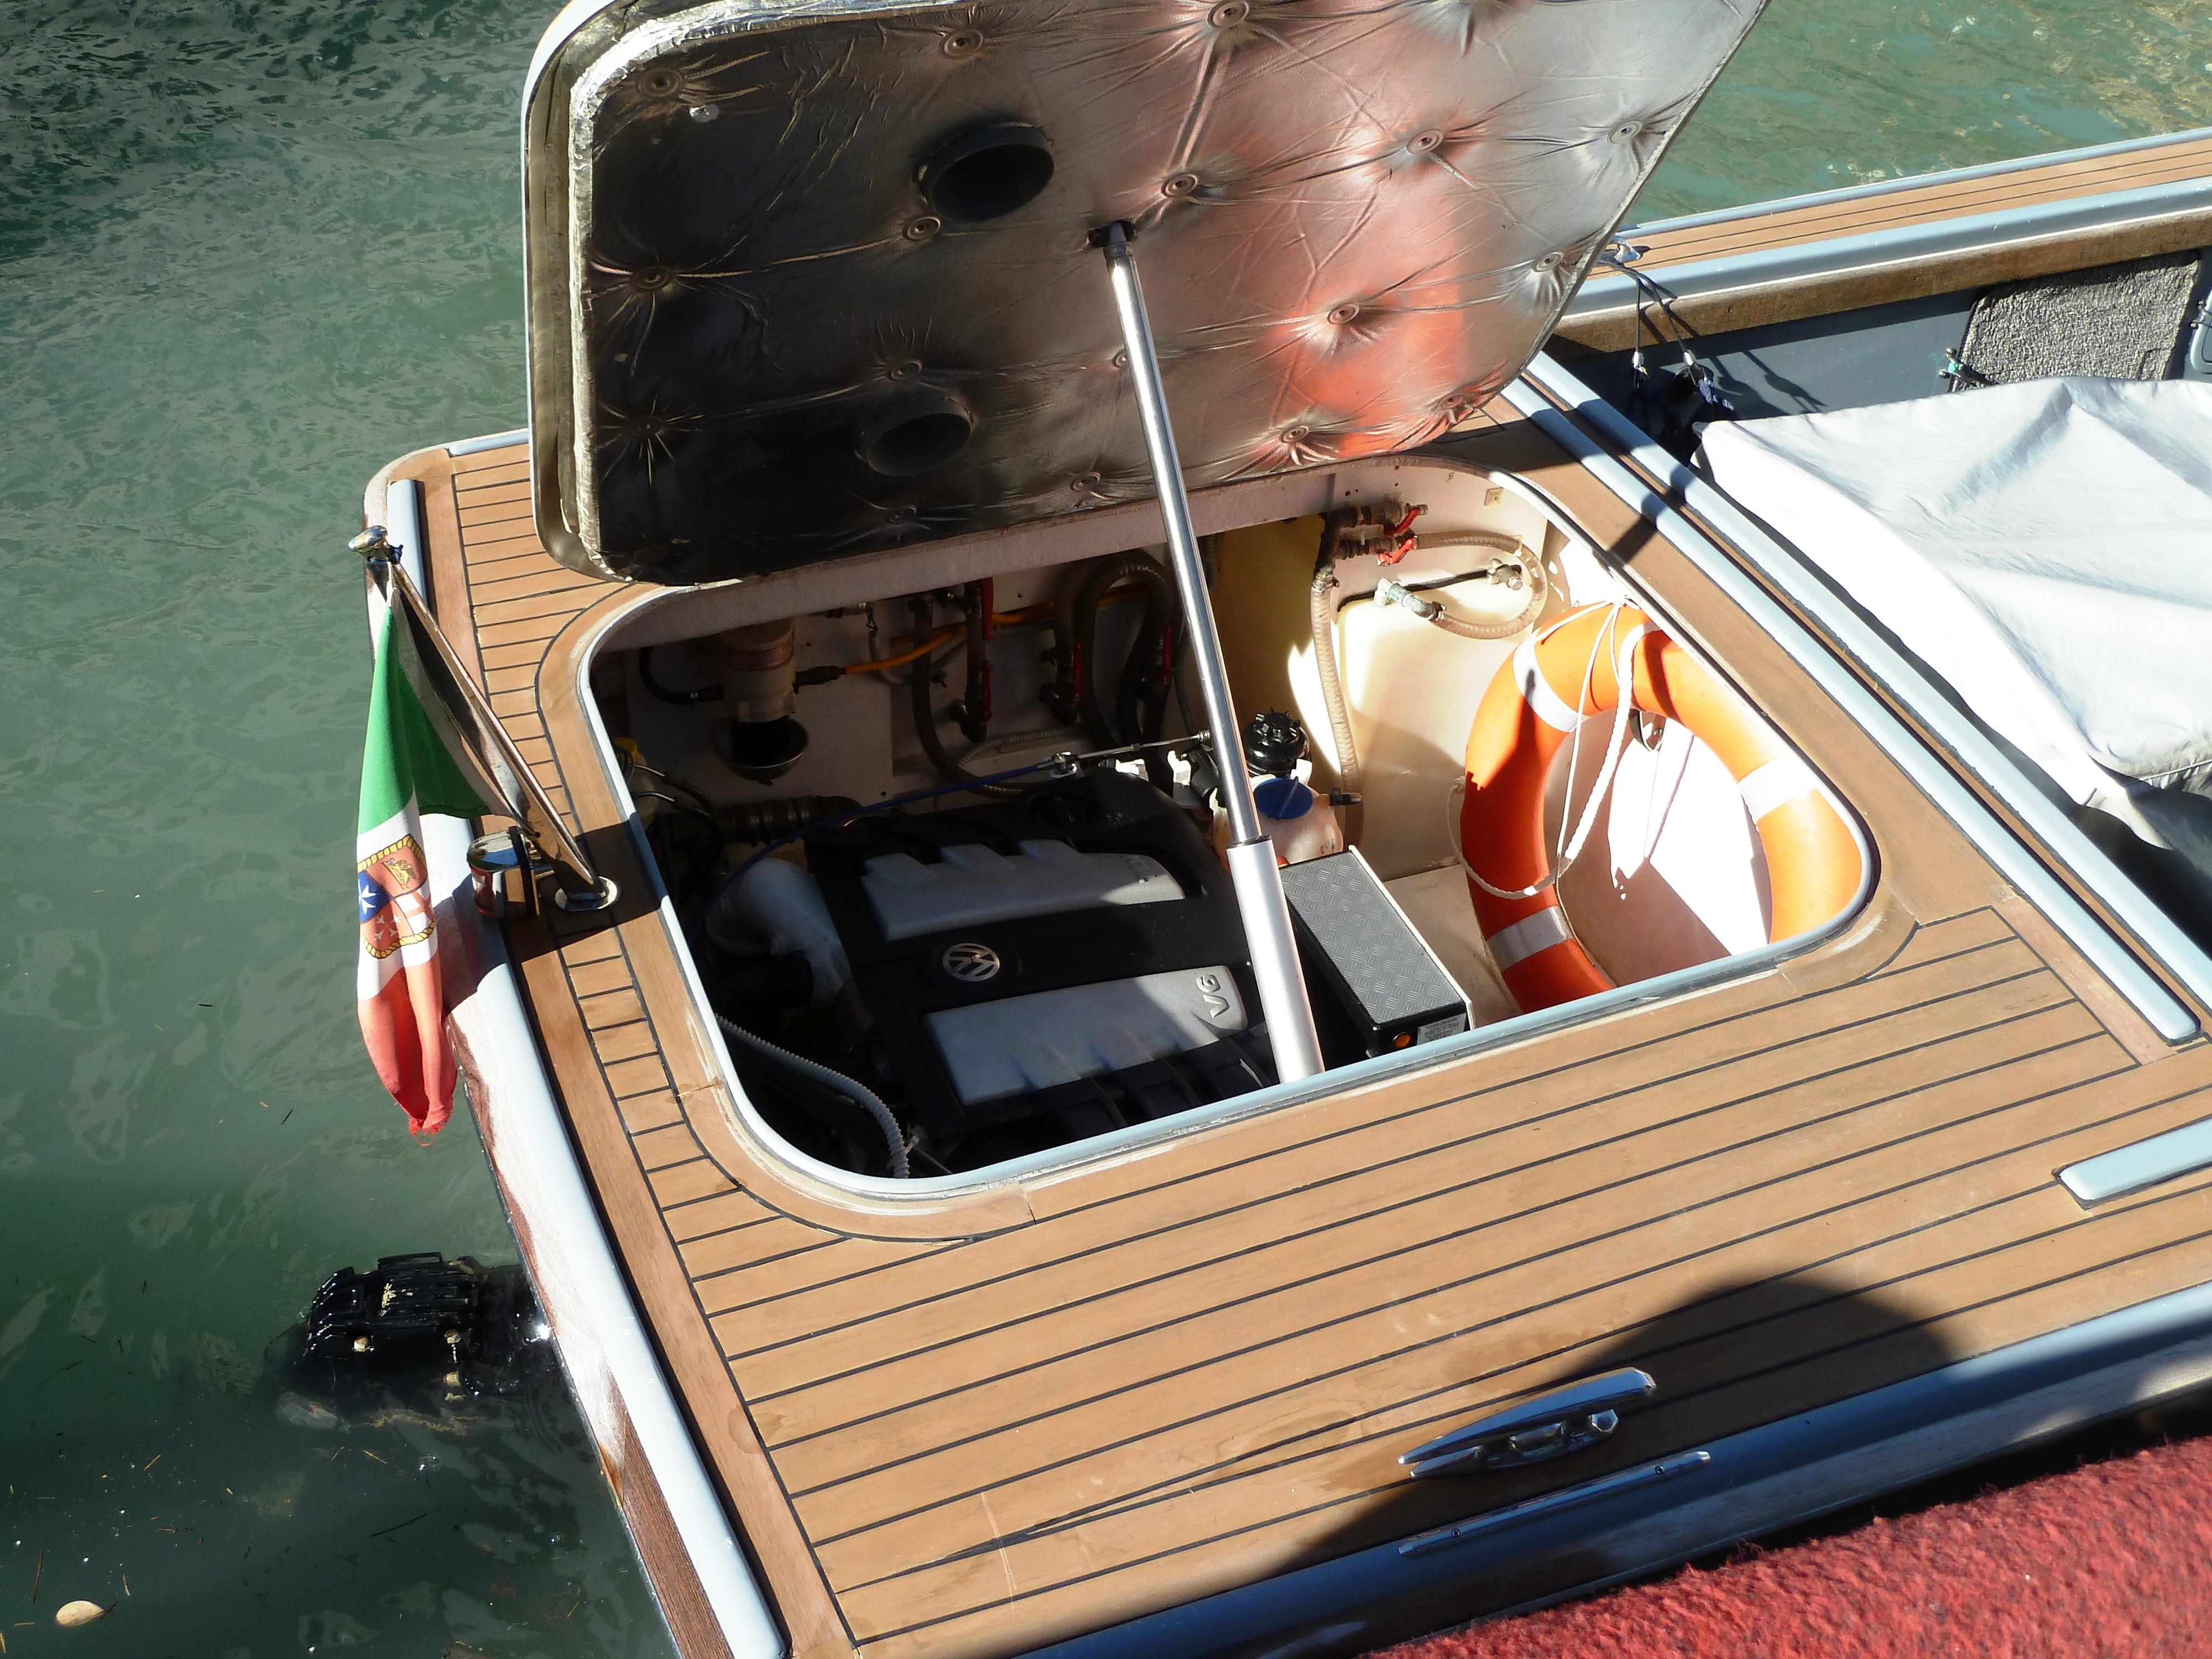 File:Inboard engine funeral boat venice.JPG - Wikimedia Commons